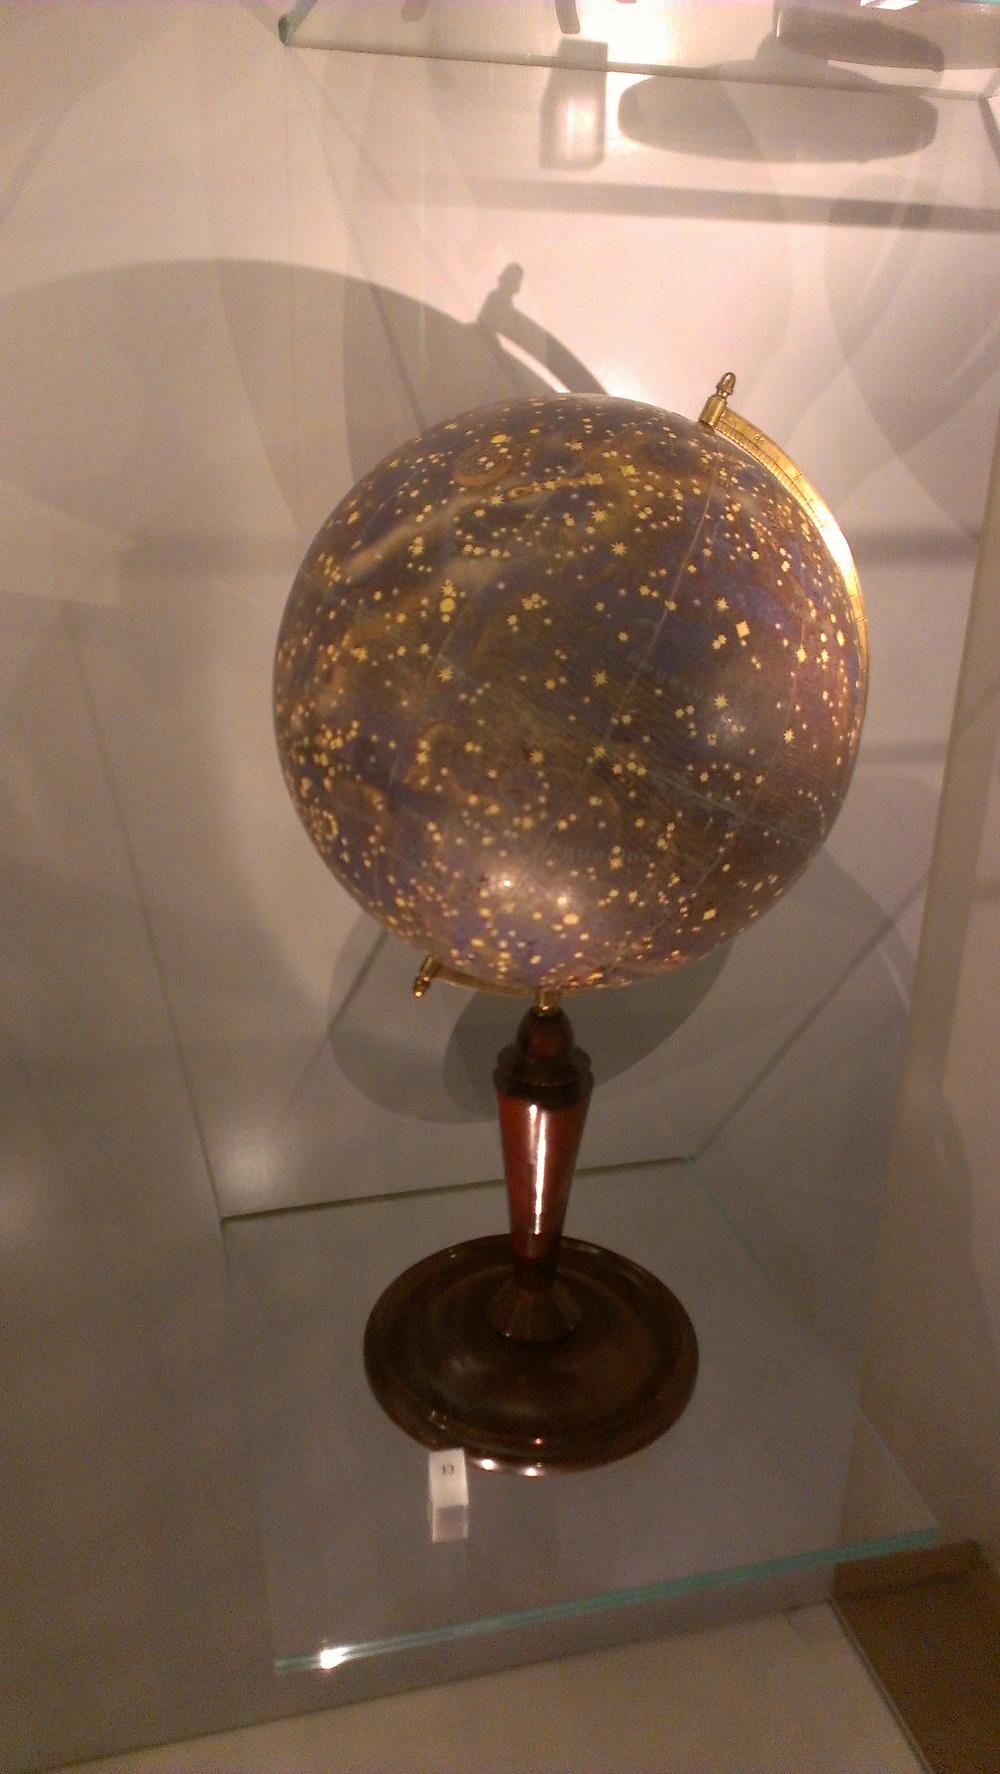 New-ish celestial globe.